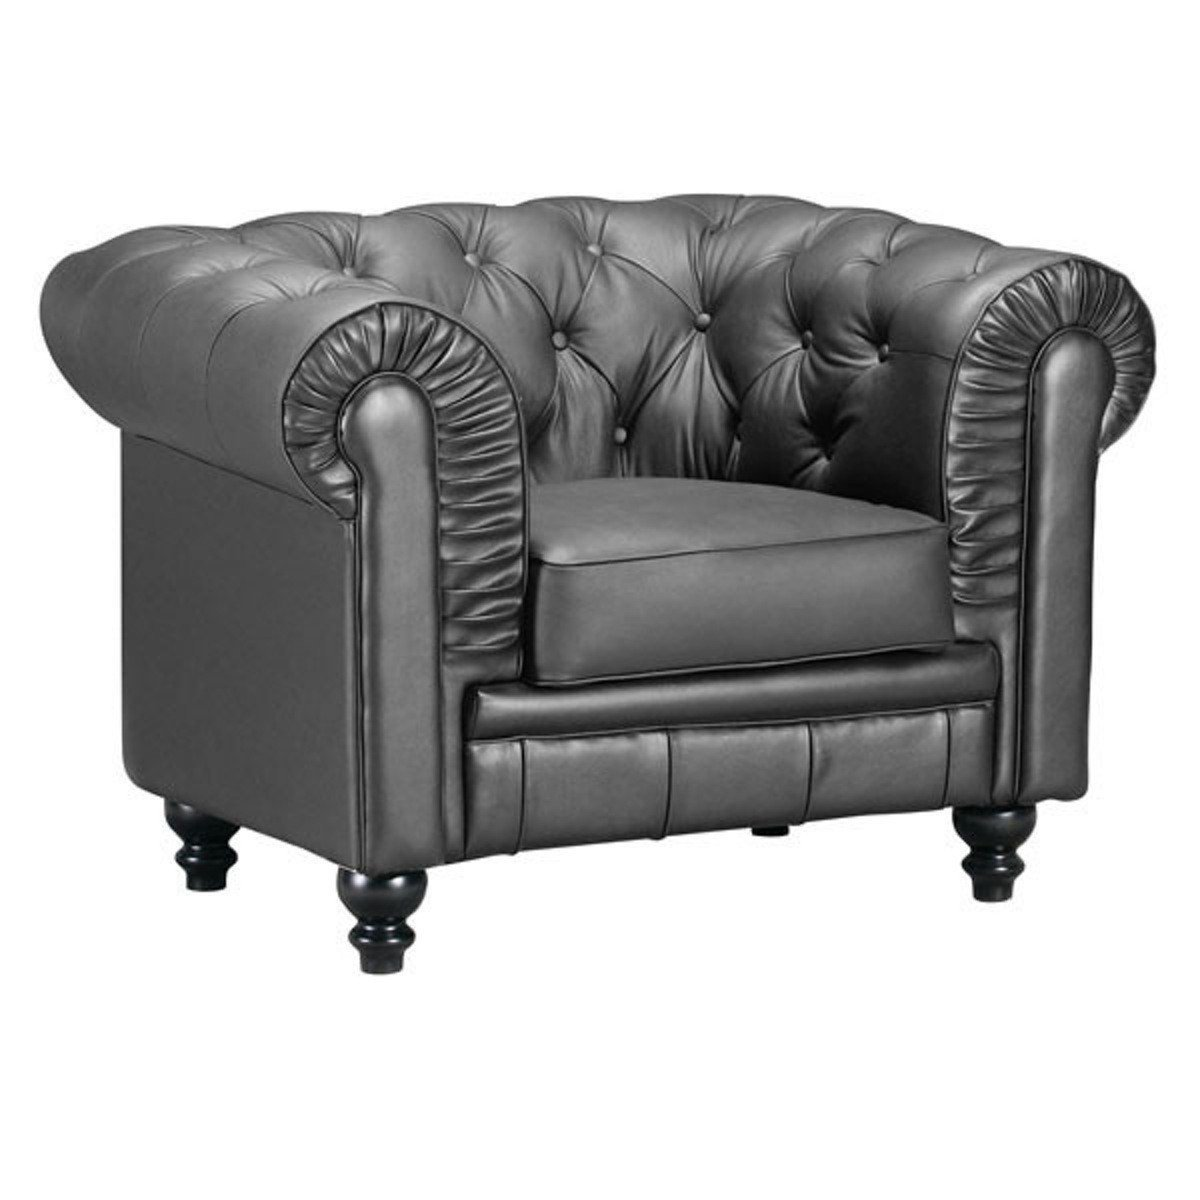 Silver Leatherette Aristocrat Armchair: Zuo Modern Aristocrat Arm Chair Black